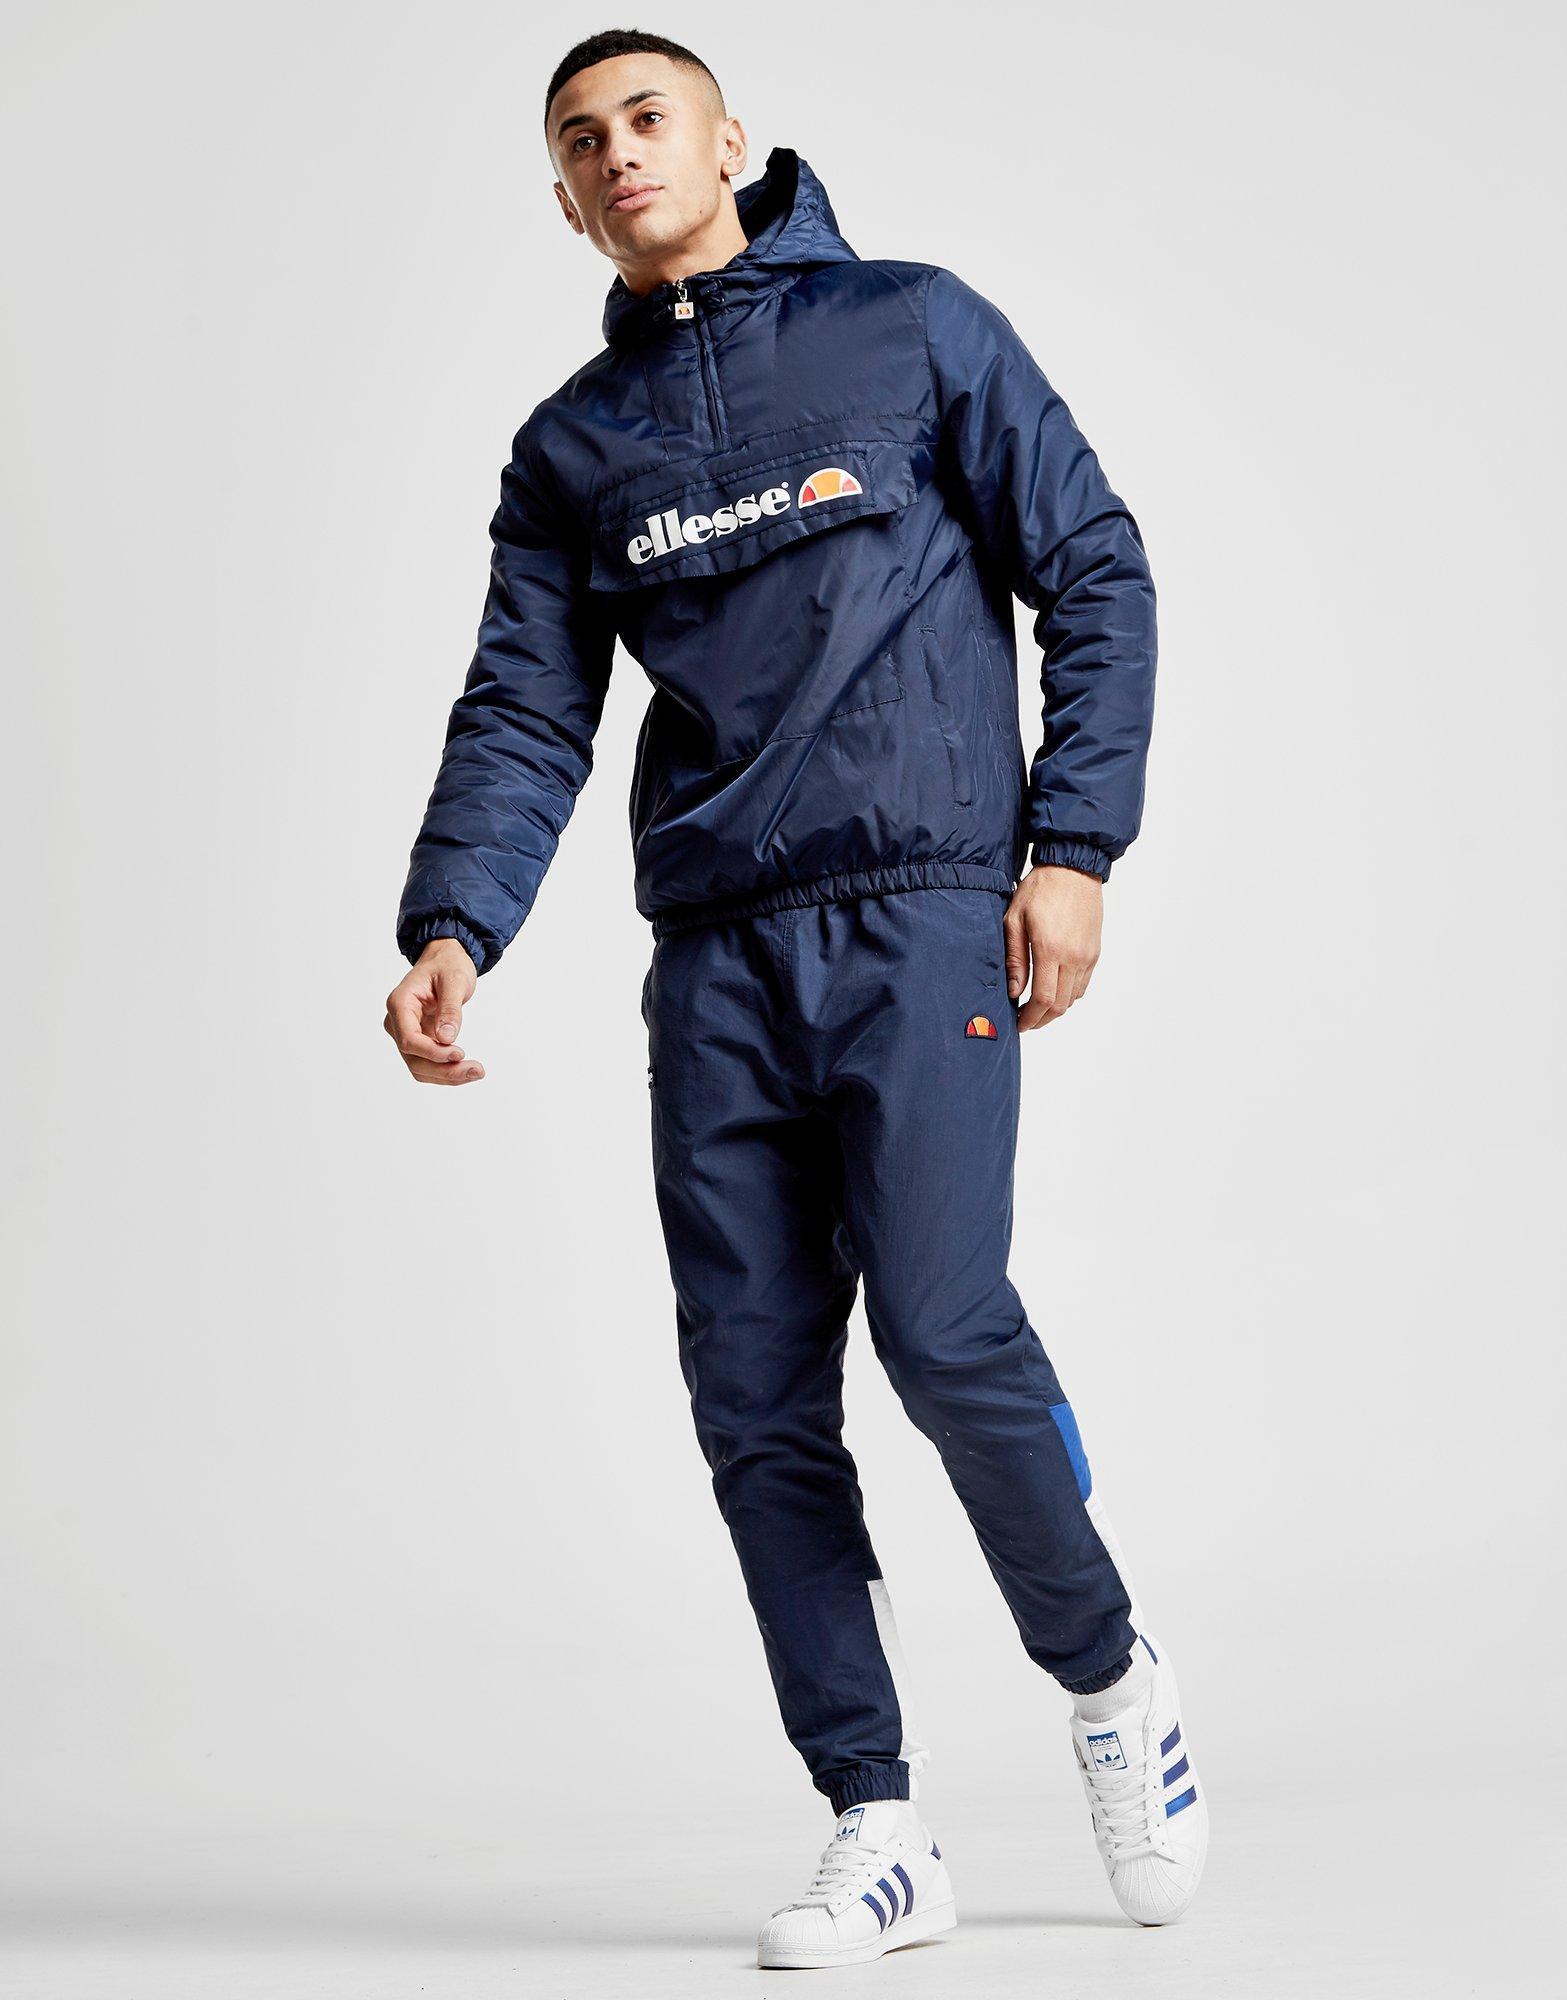 c9075b95149 Ellesse Blue Mont 1/4 Zip Jacket for men